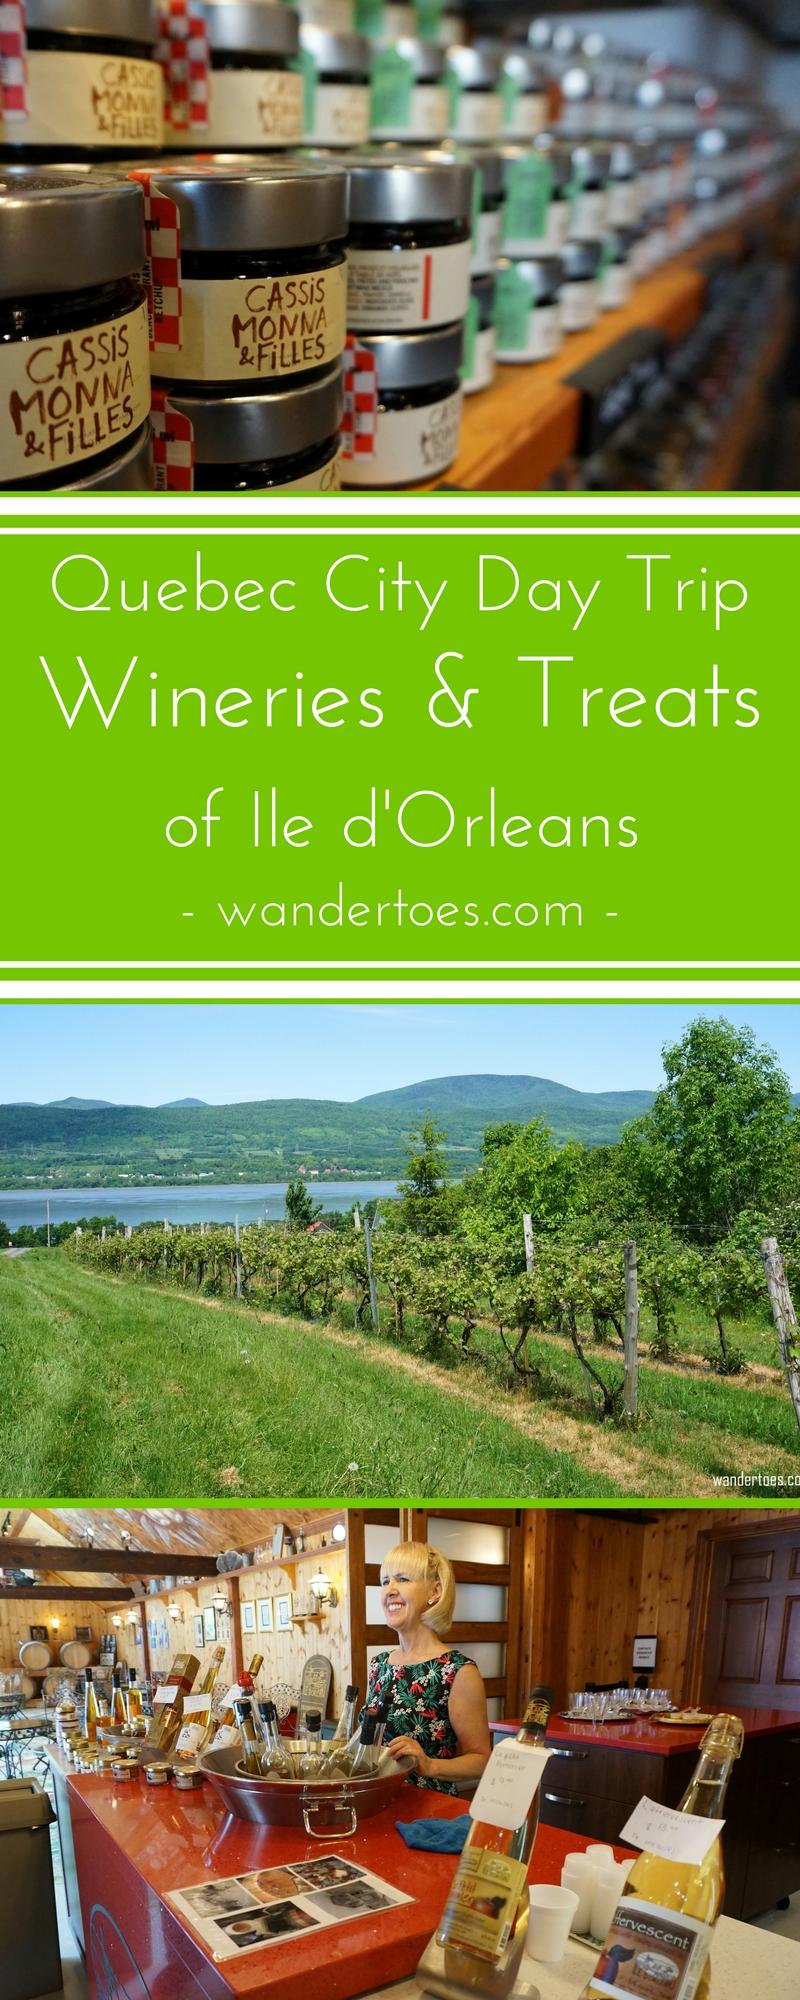 Ile d'Orleans, Quebec City, Canada: A delicious tour of the